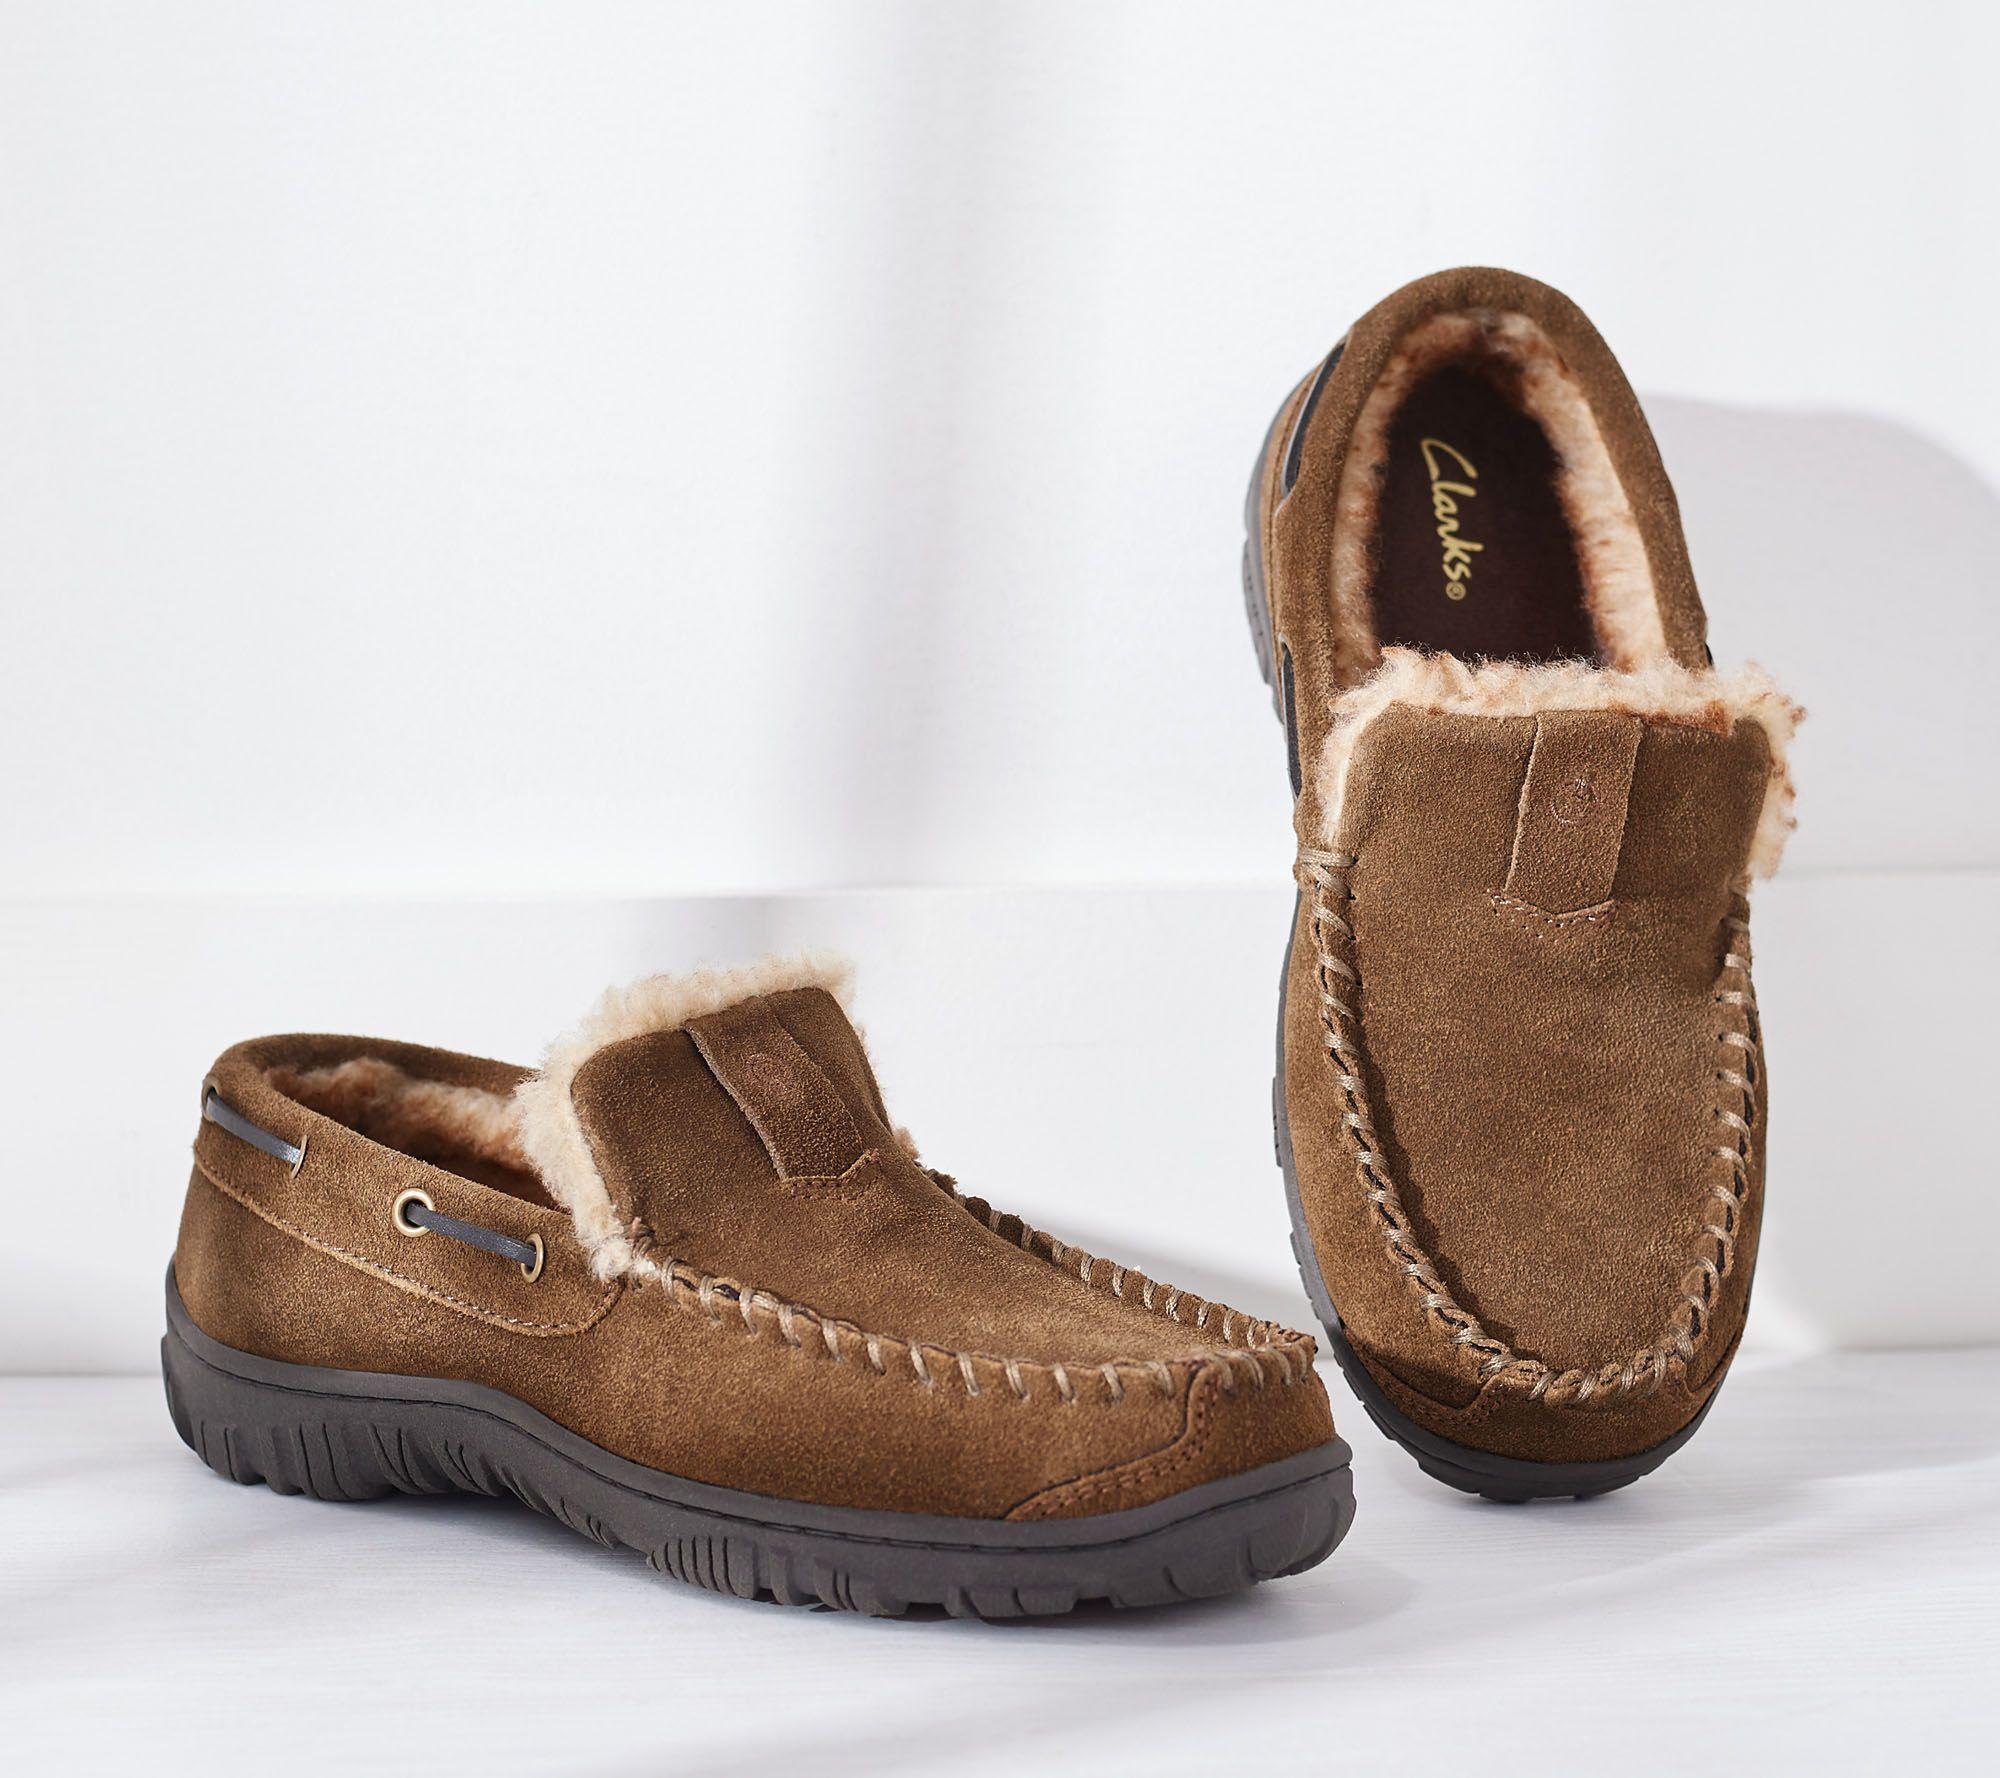 Minnetonka Alex Rose Gold Crib Booties Baby Girl Size 1 75/% Off Retail